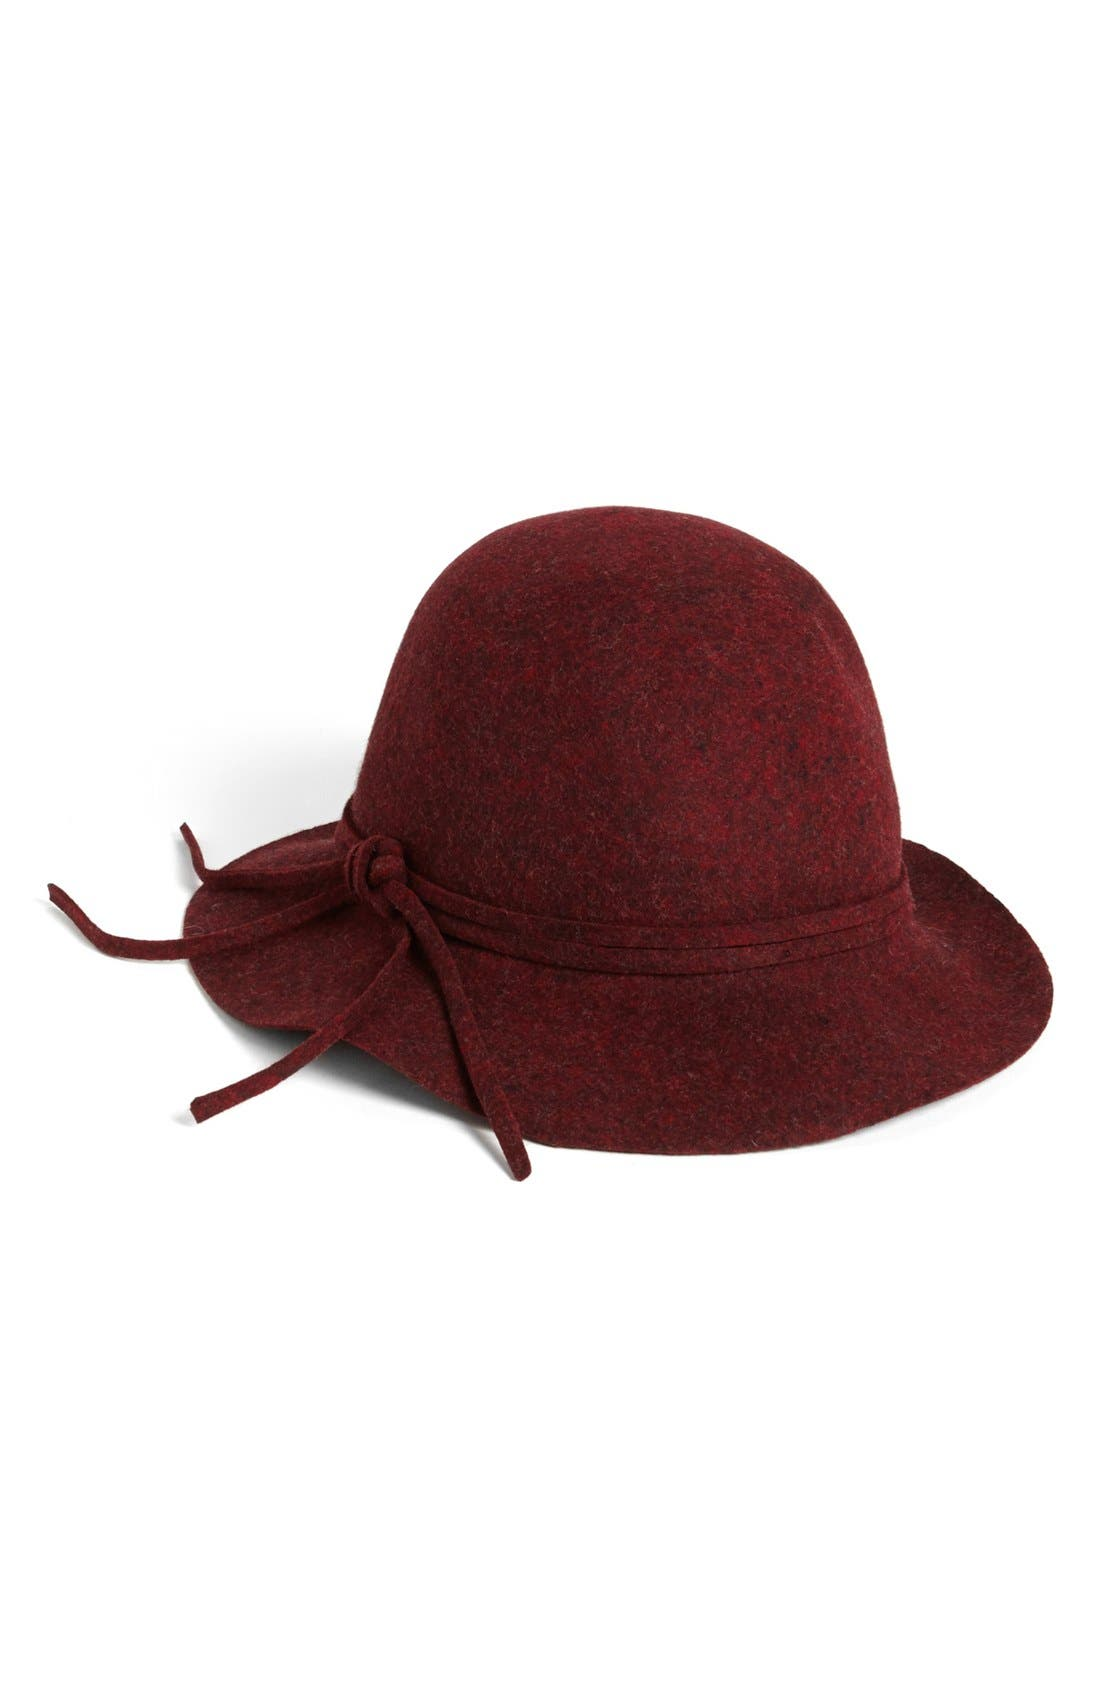 Alternate Image 1 Selected - Nordstrom Felt Hat